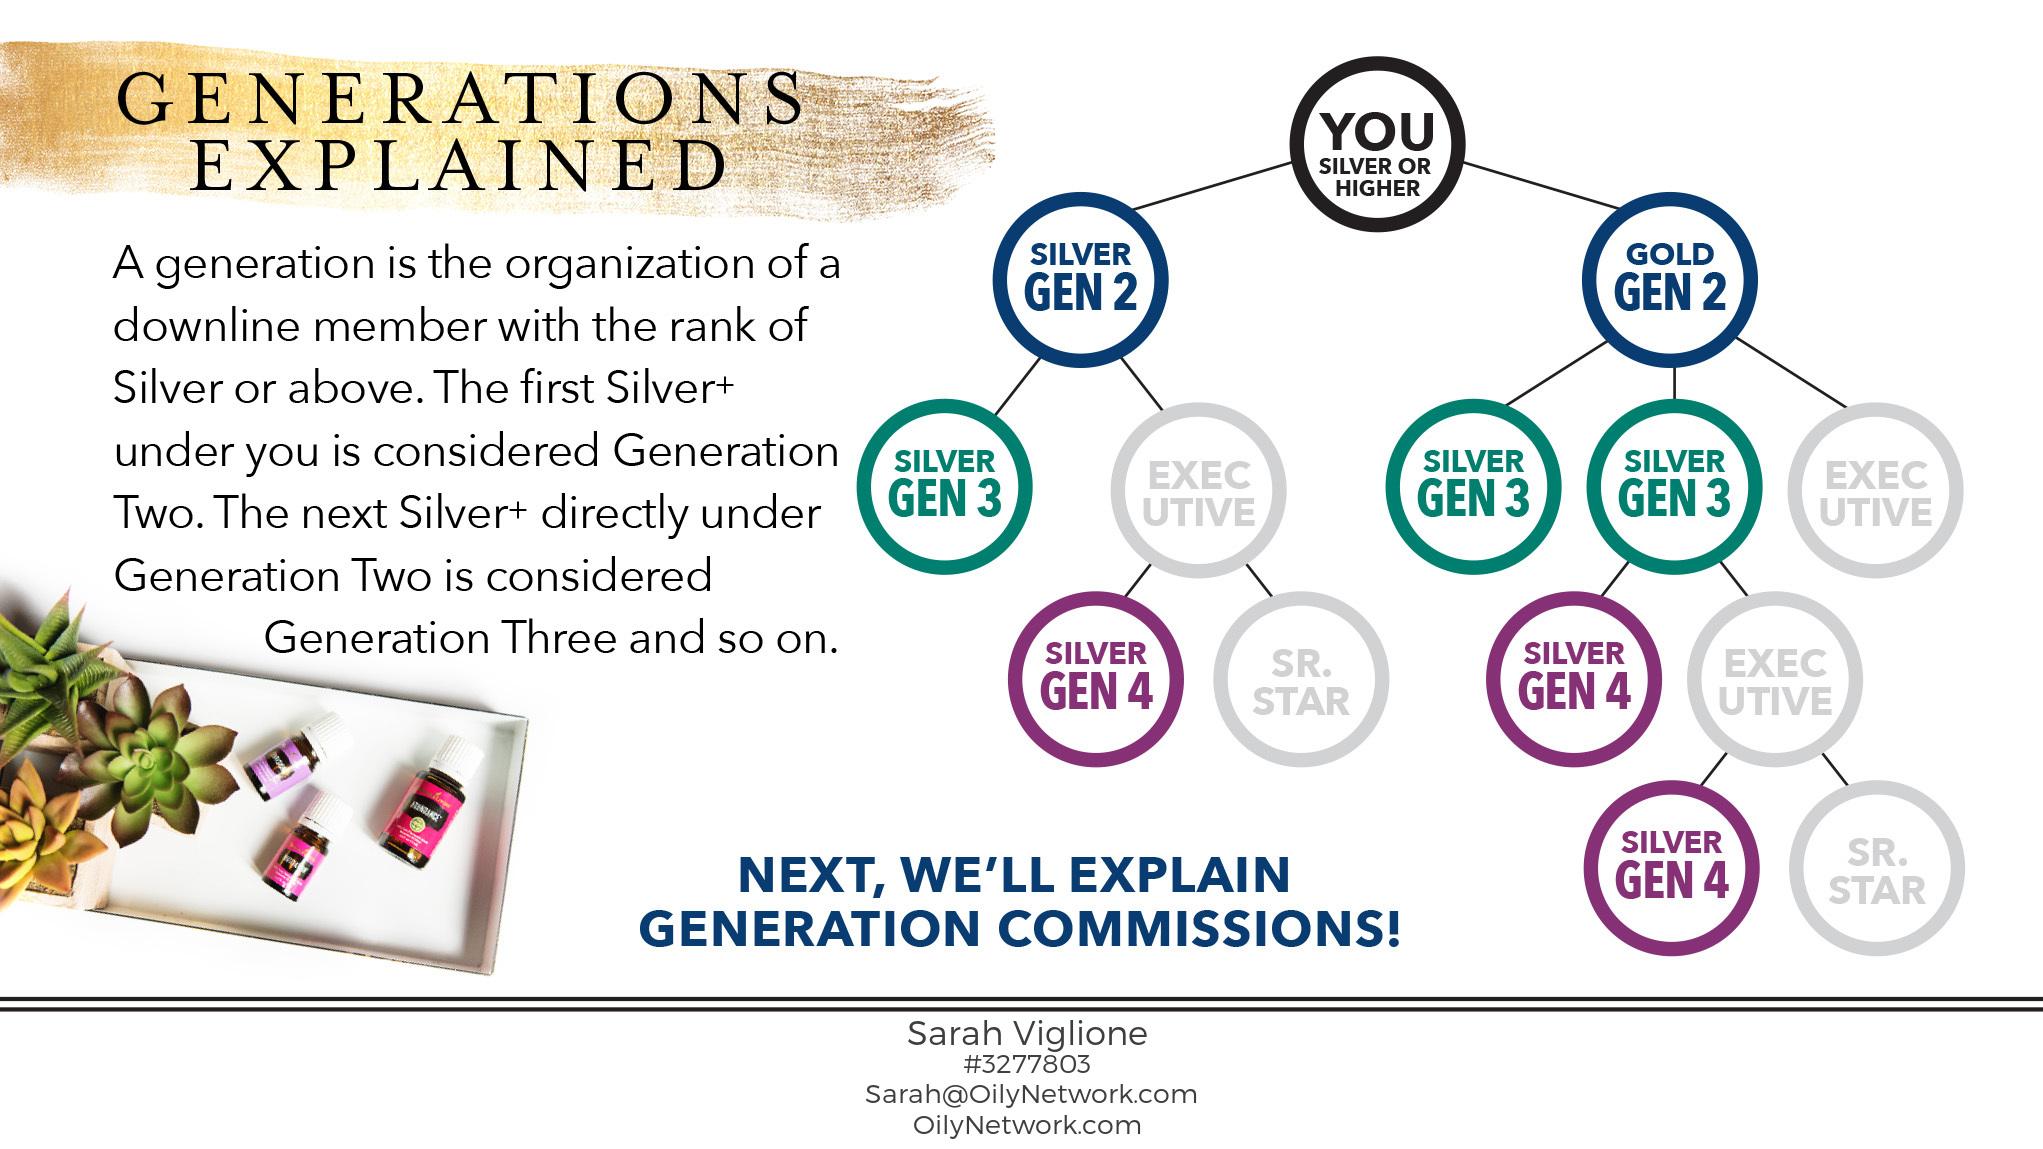 Generations Explained